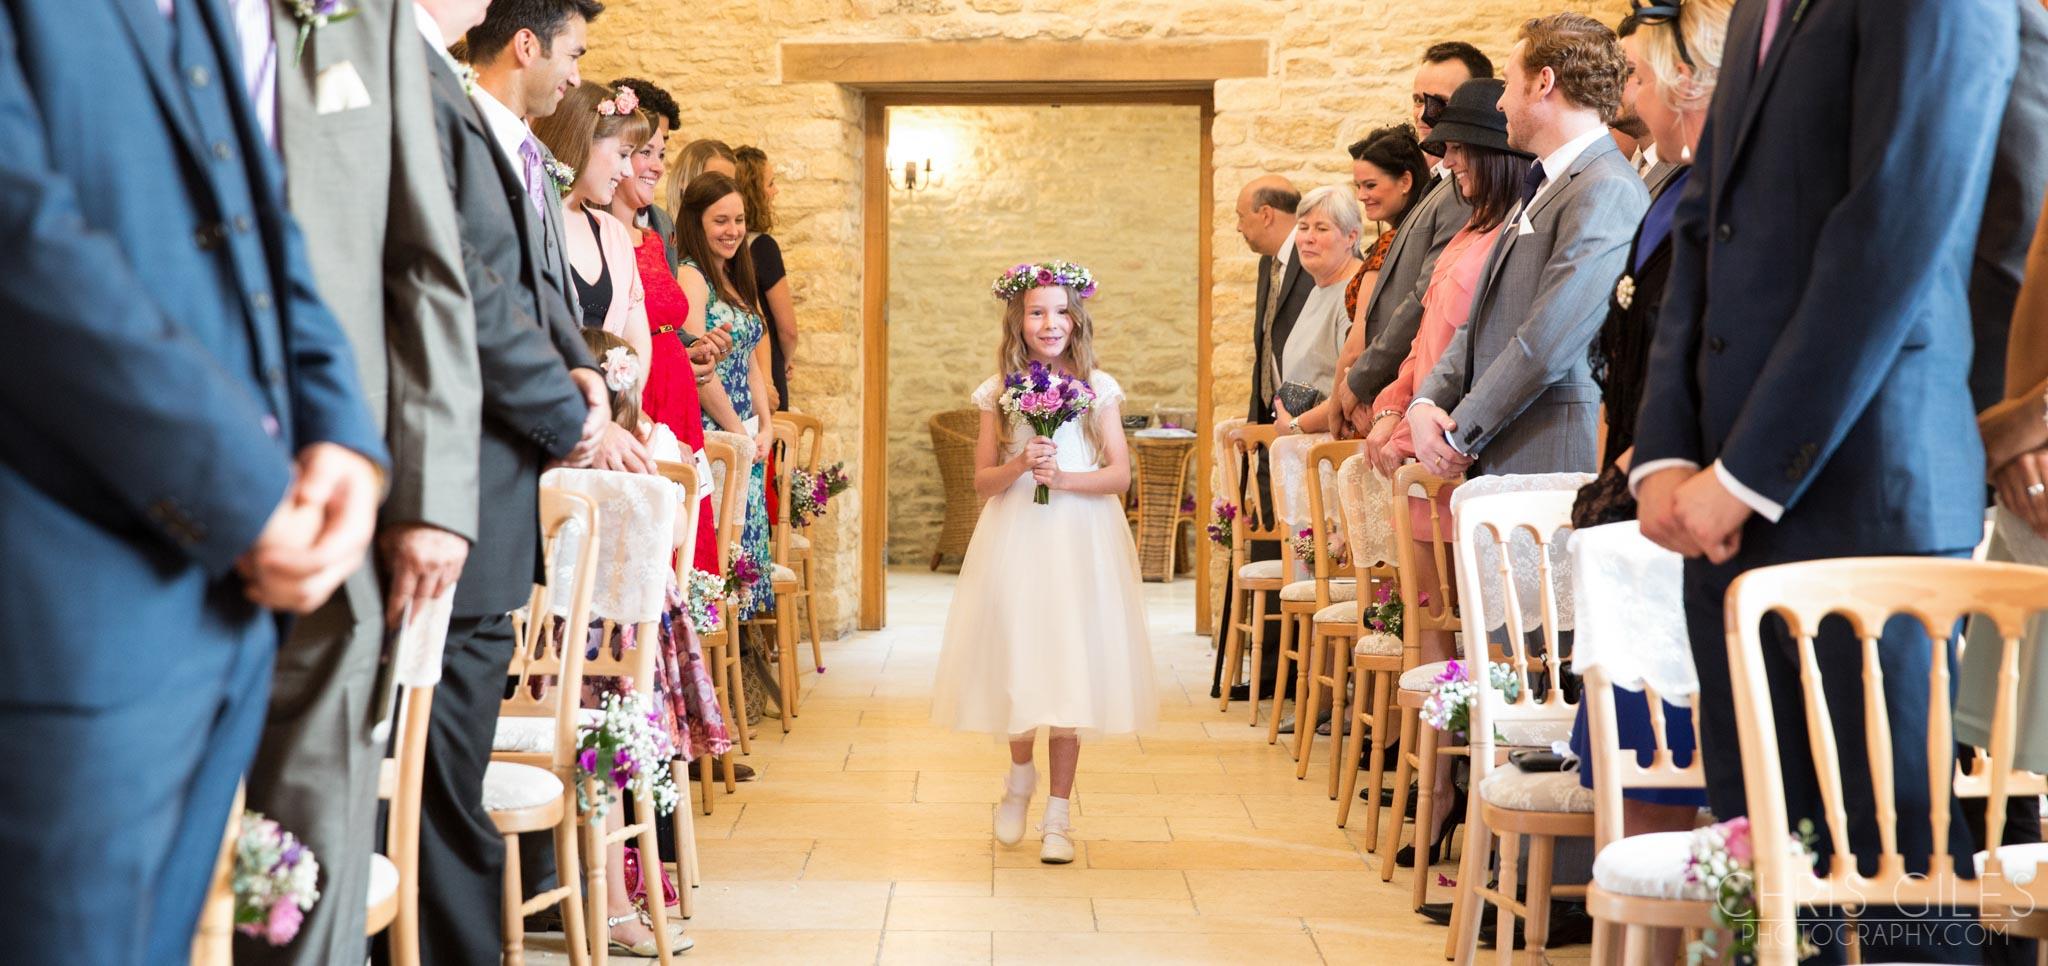 Kingscote Barn Wedding